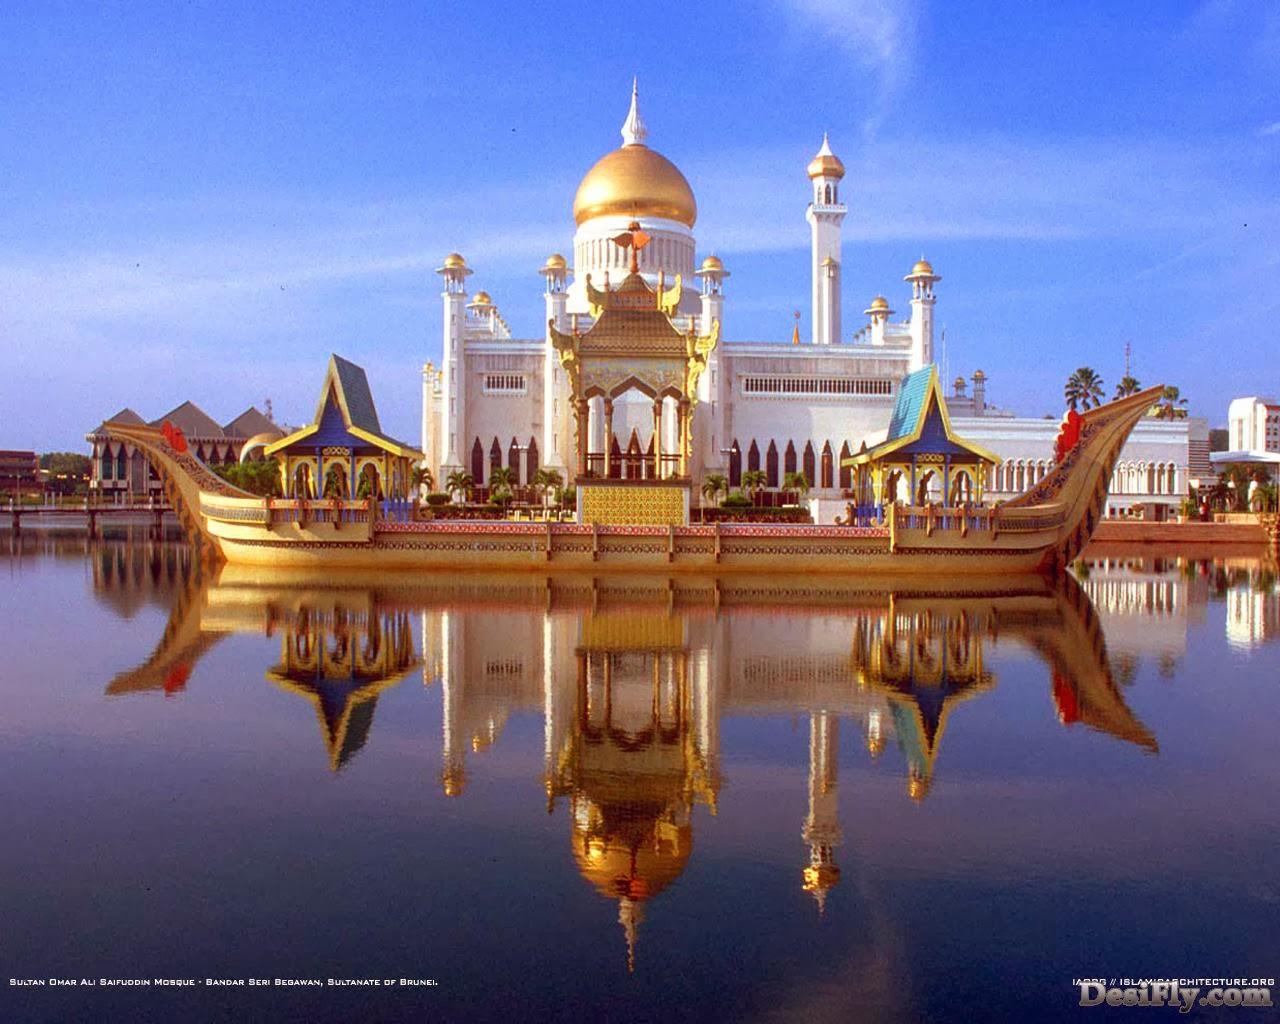 Wallpaper Gallery Masjid Wallpaper